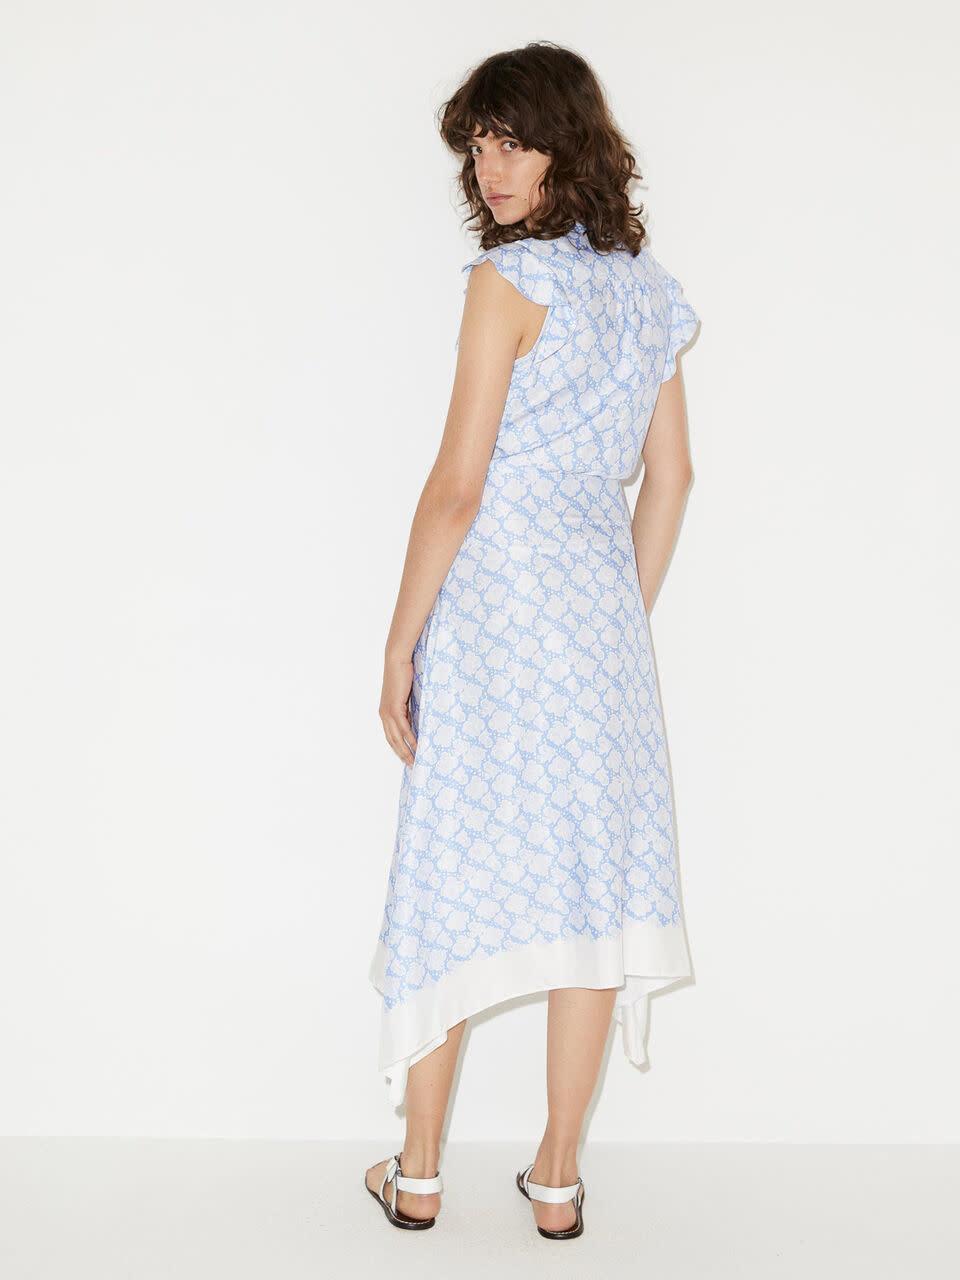 Paine dress by malene birger-2